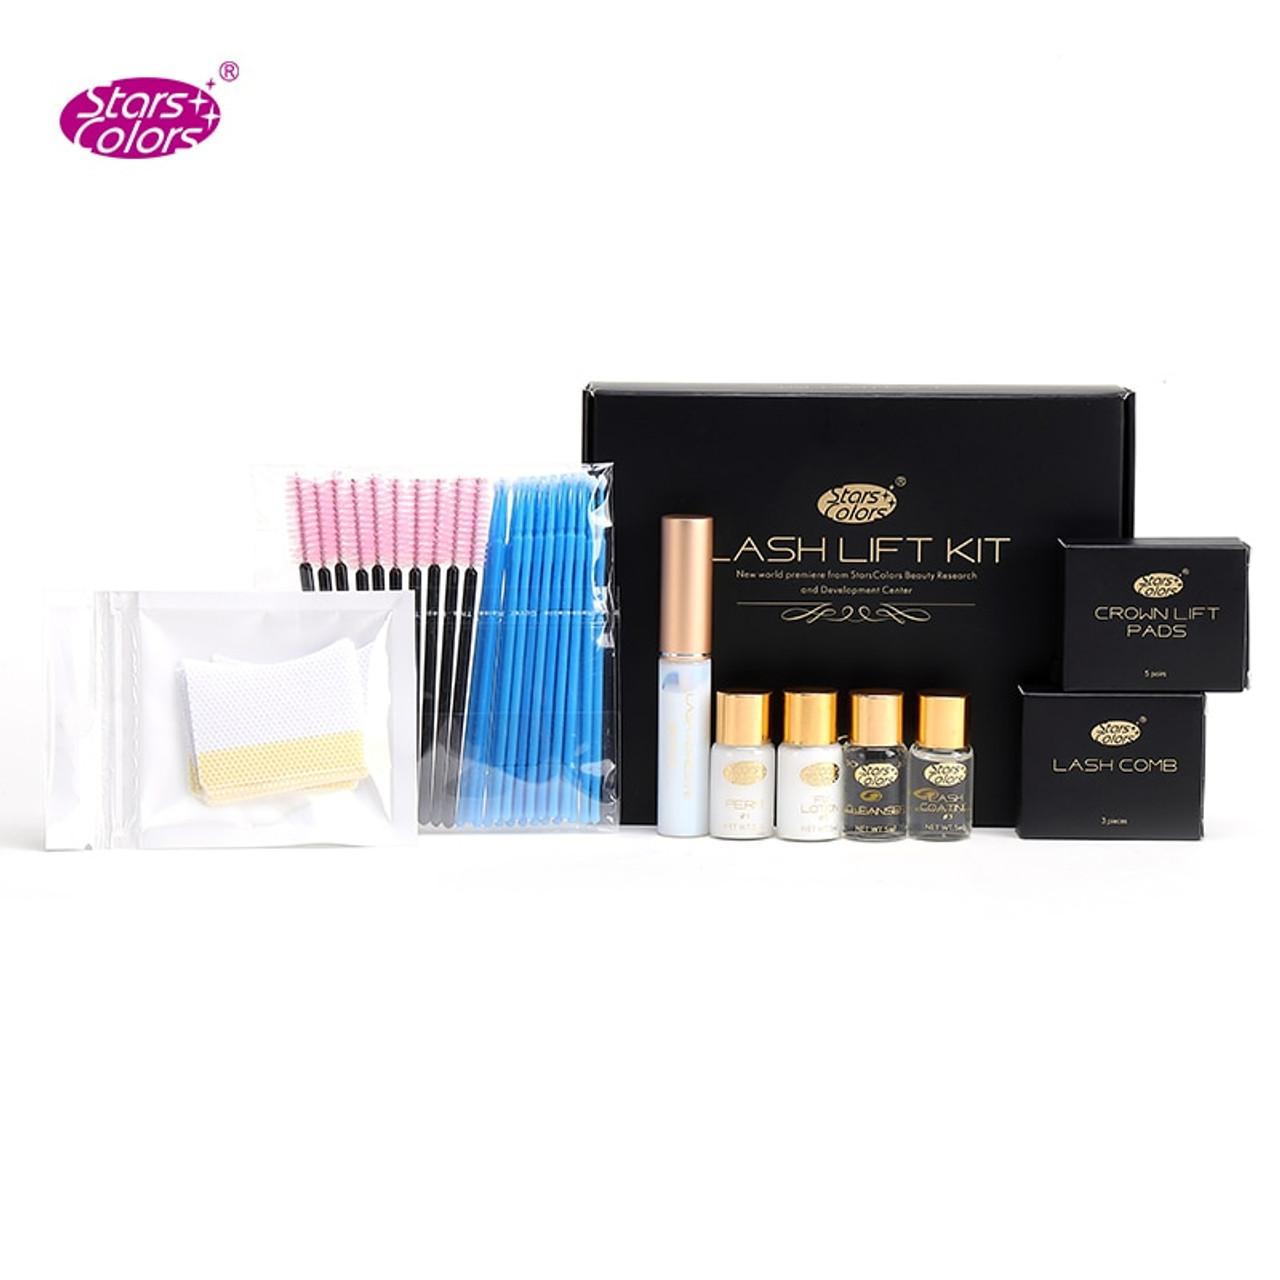 86d3bb7c480 Professional Lash lift Kit Makeupbemine Eyelash Perming Kit Upgrated  Version Lash Lift Kit Can Do Your ...